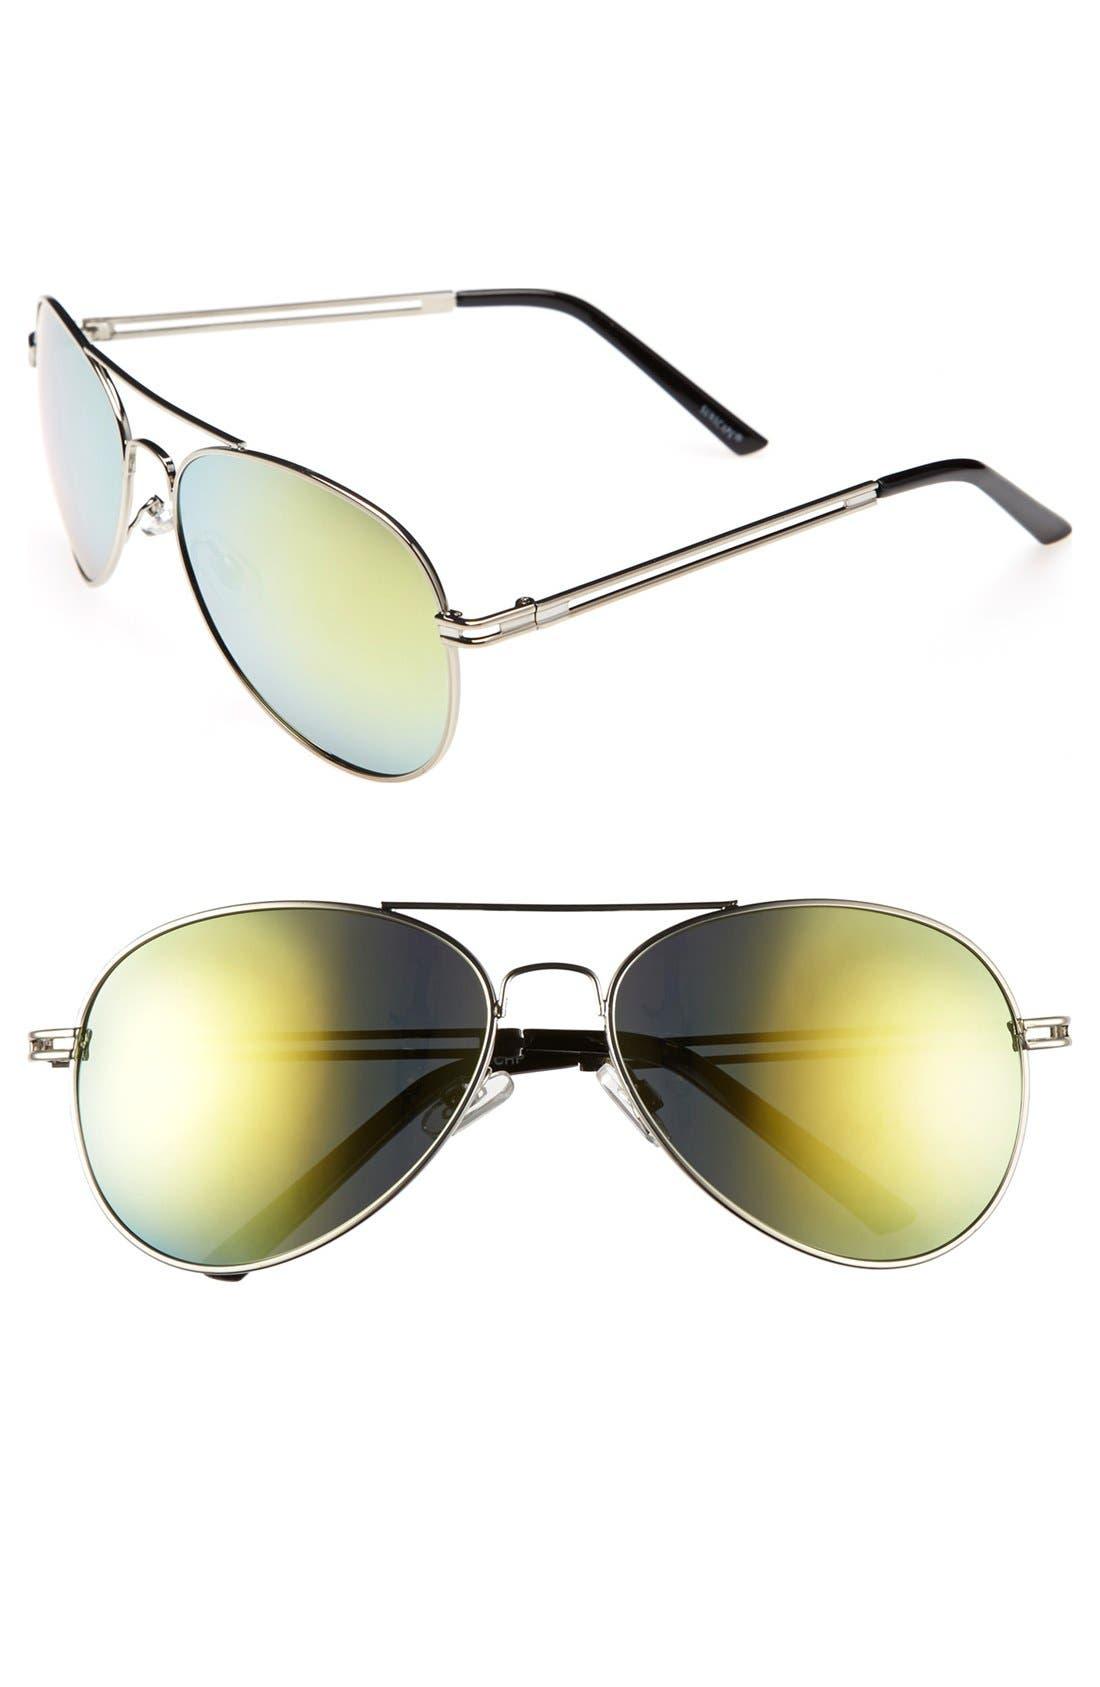 Alternate Image 1 Selected - BP. 'Flash' Aviator Sunglasses (Juniors)